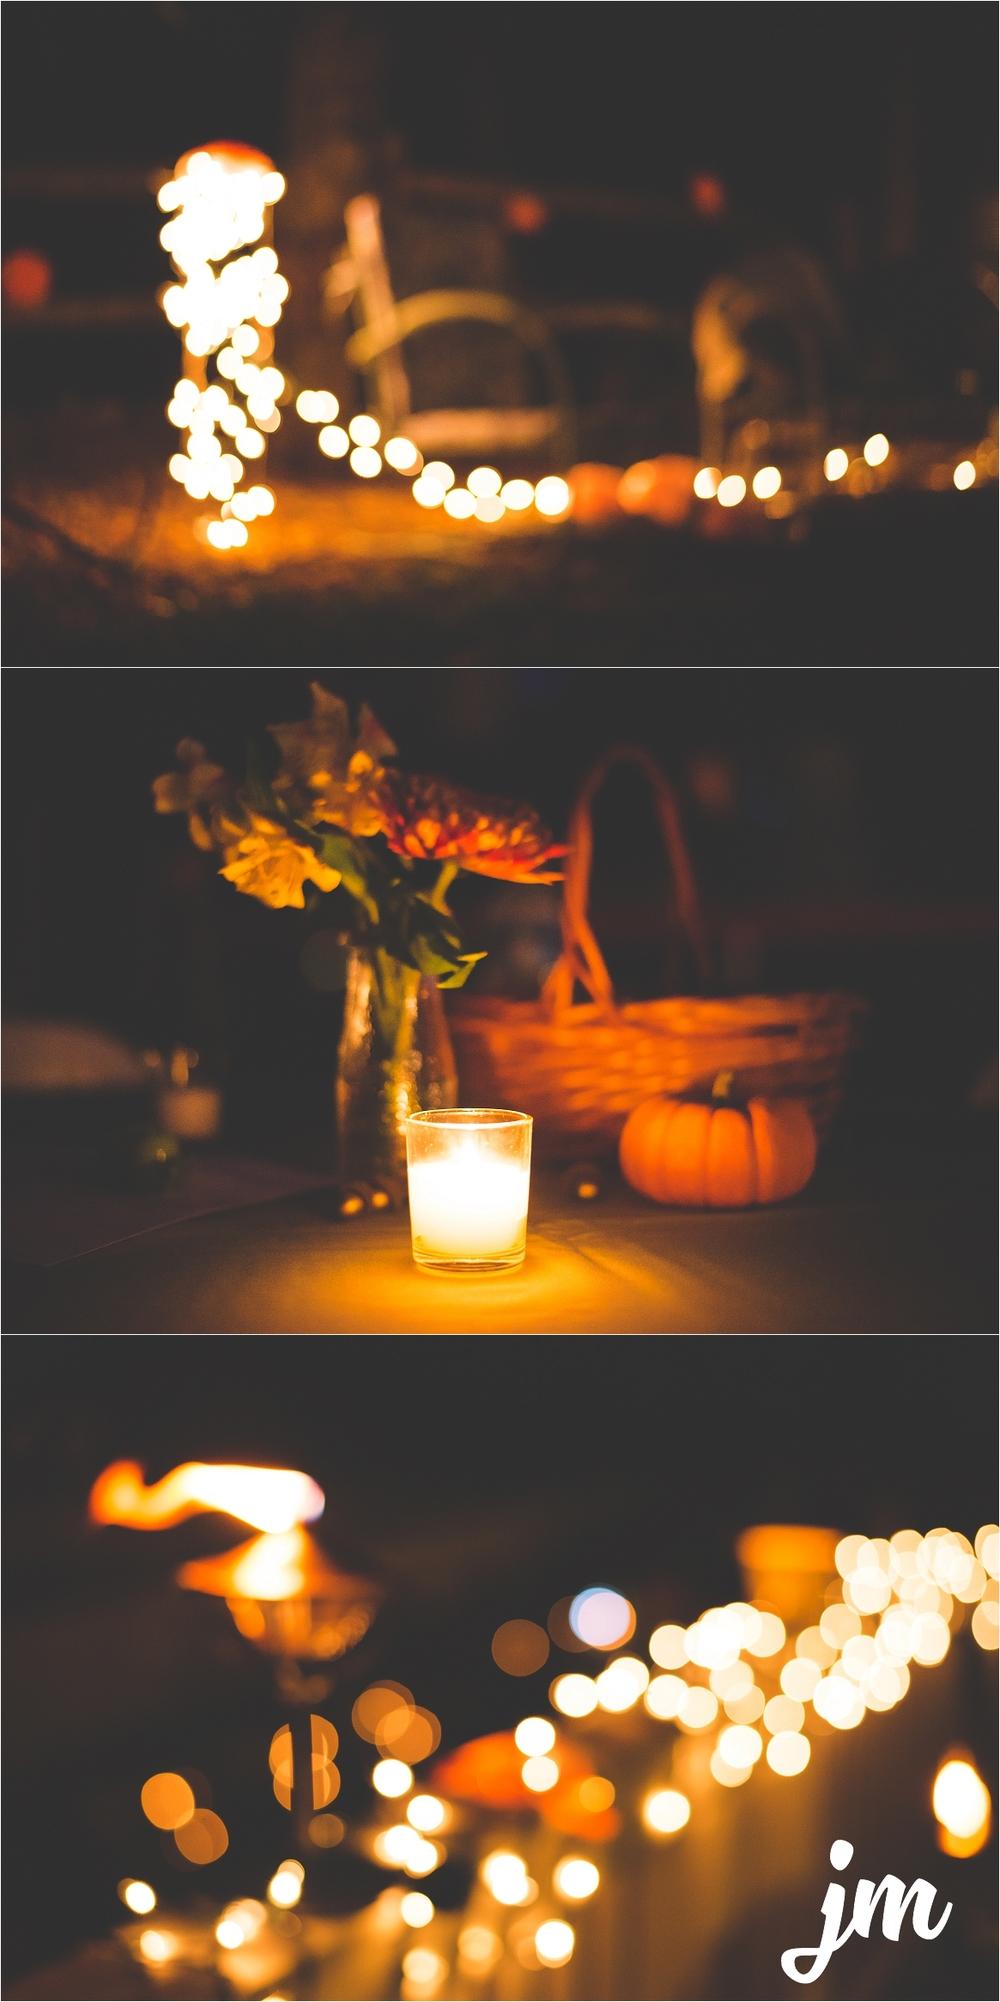 backyard-wedding-pacific-northwest-photographer-jannicka-mayte_0050.jpg